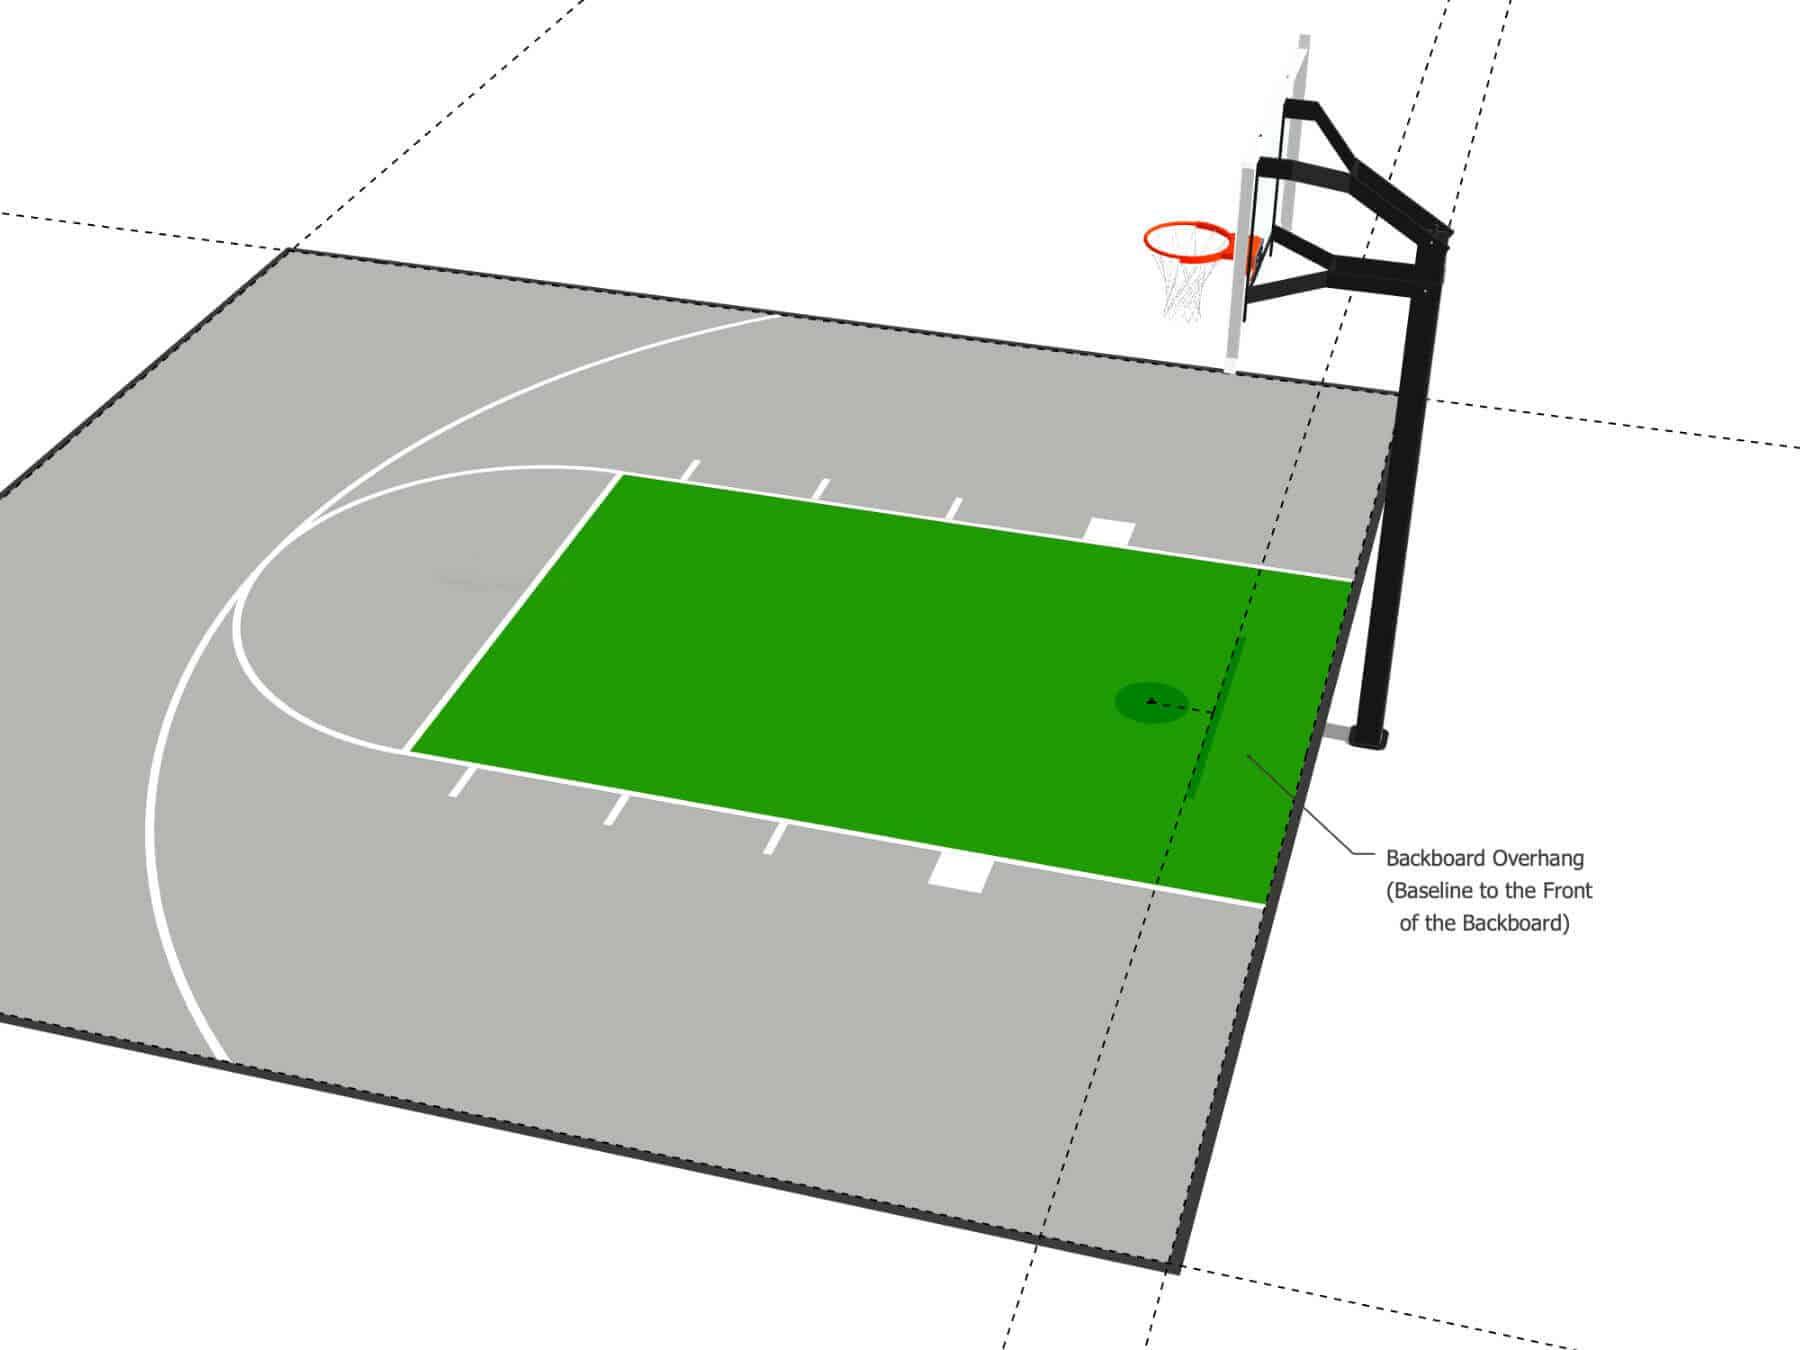 Basketball Backboard Overhange Dimension